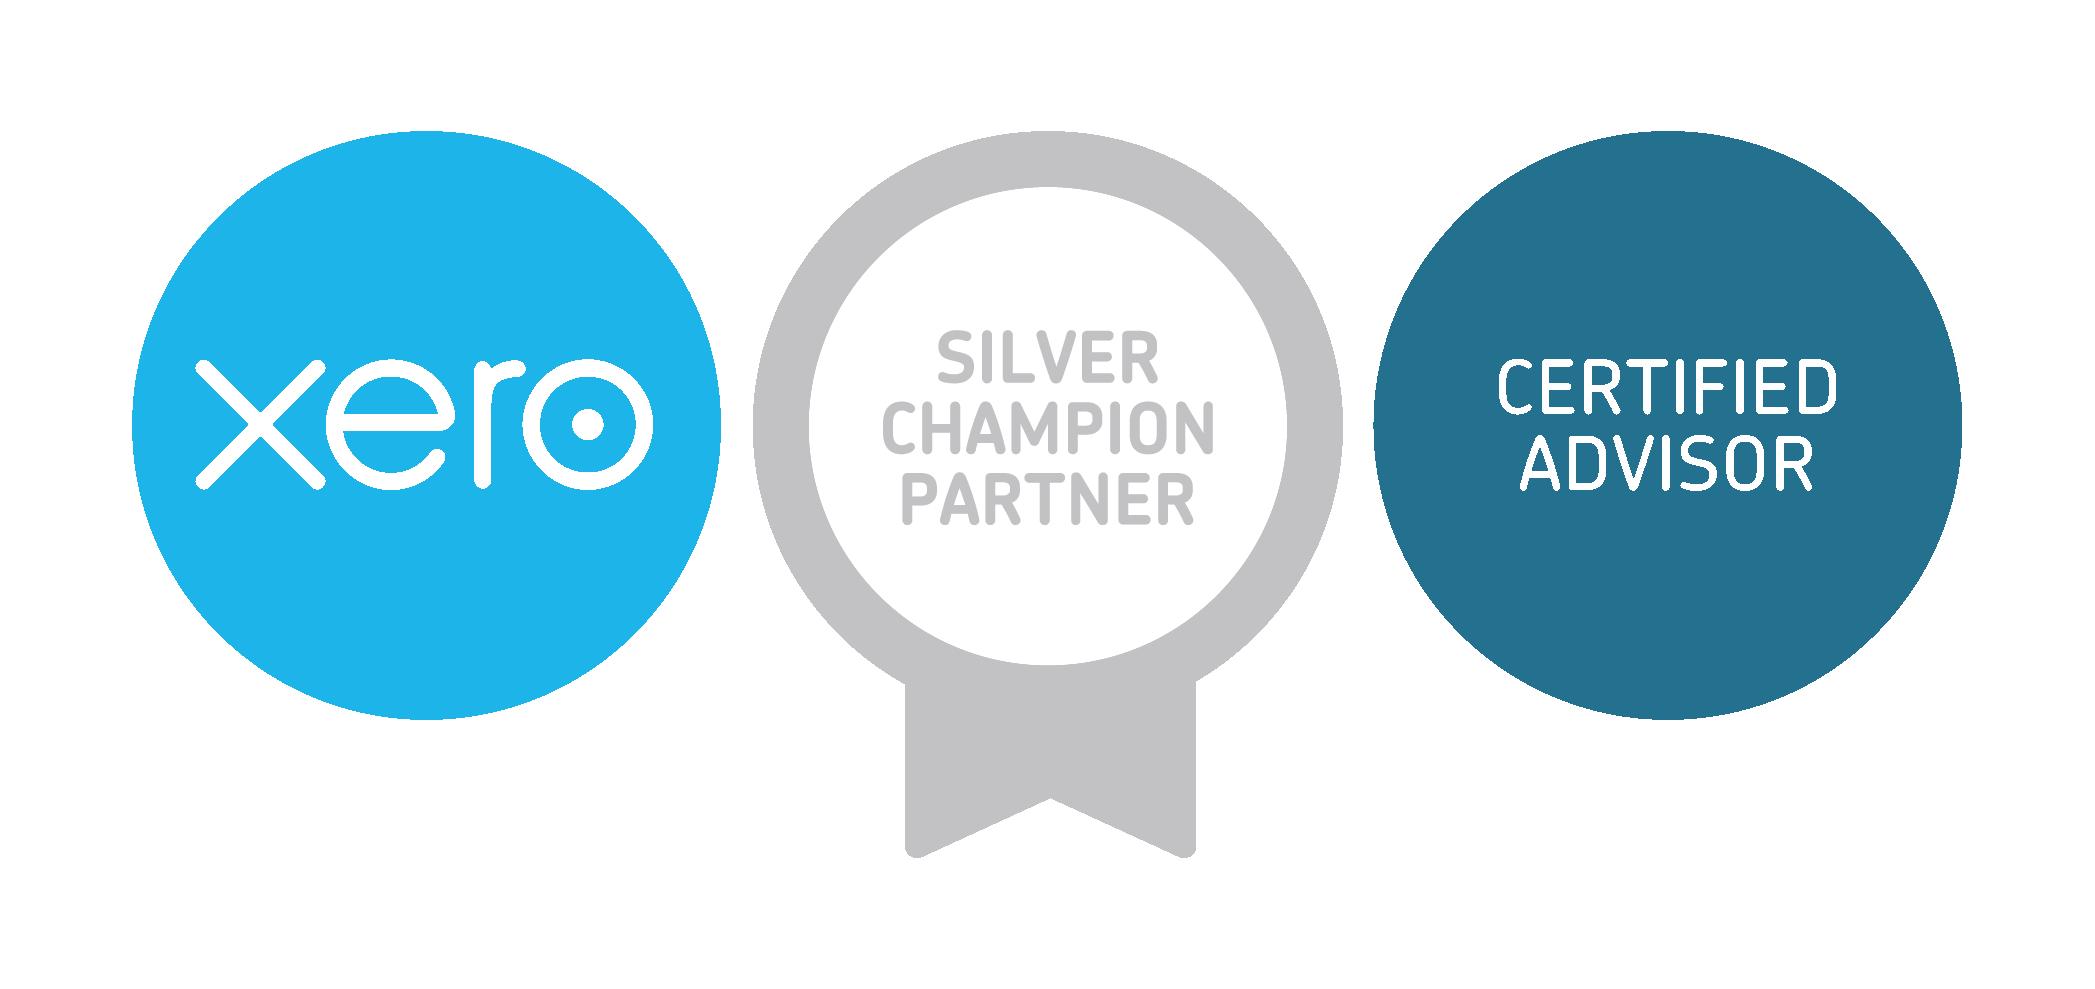 Xero Silver Champion Partner - Certified Advisor